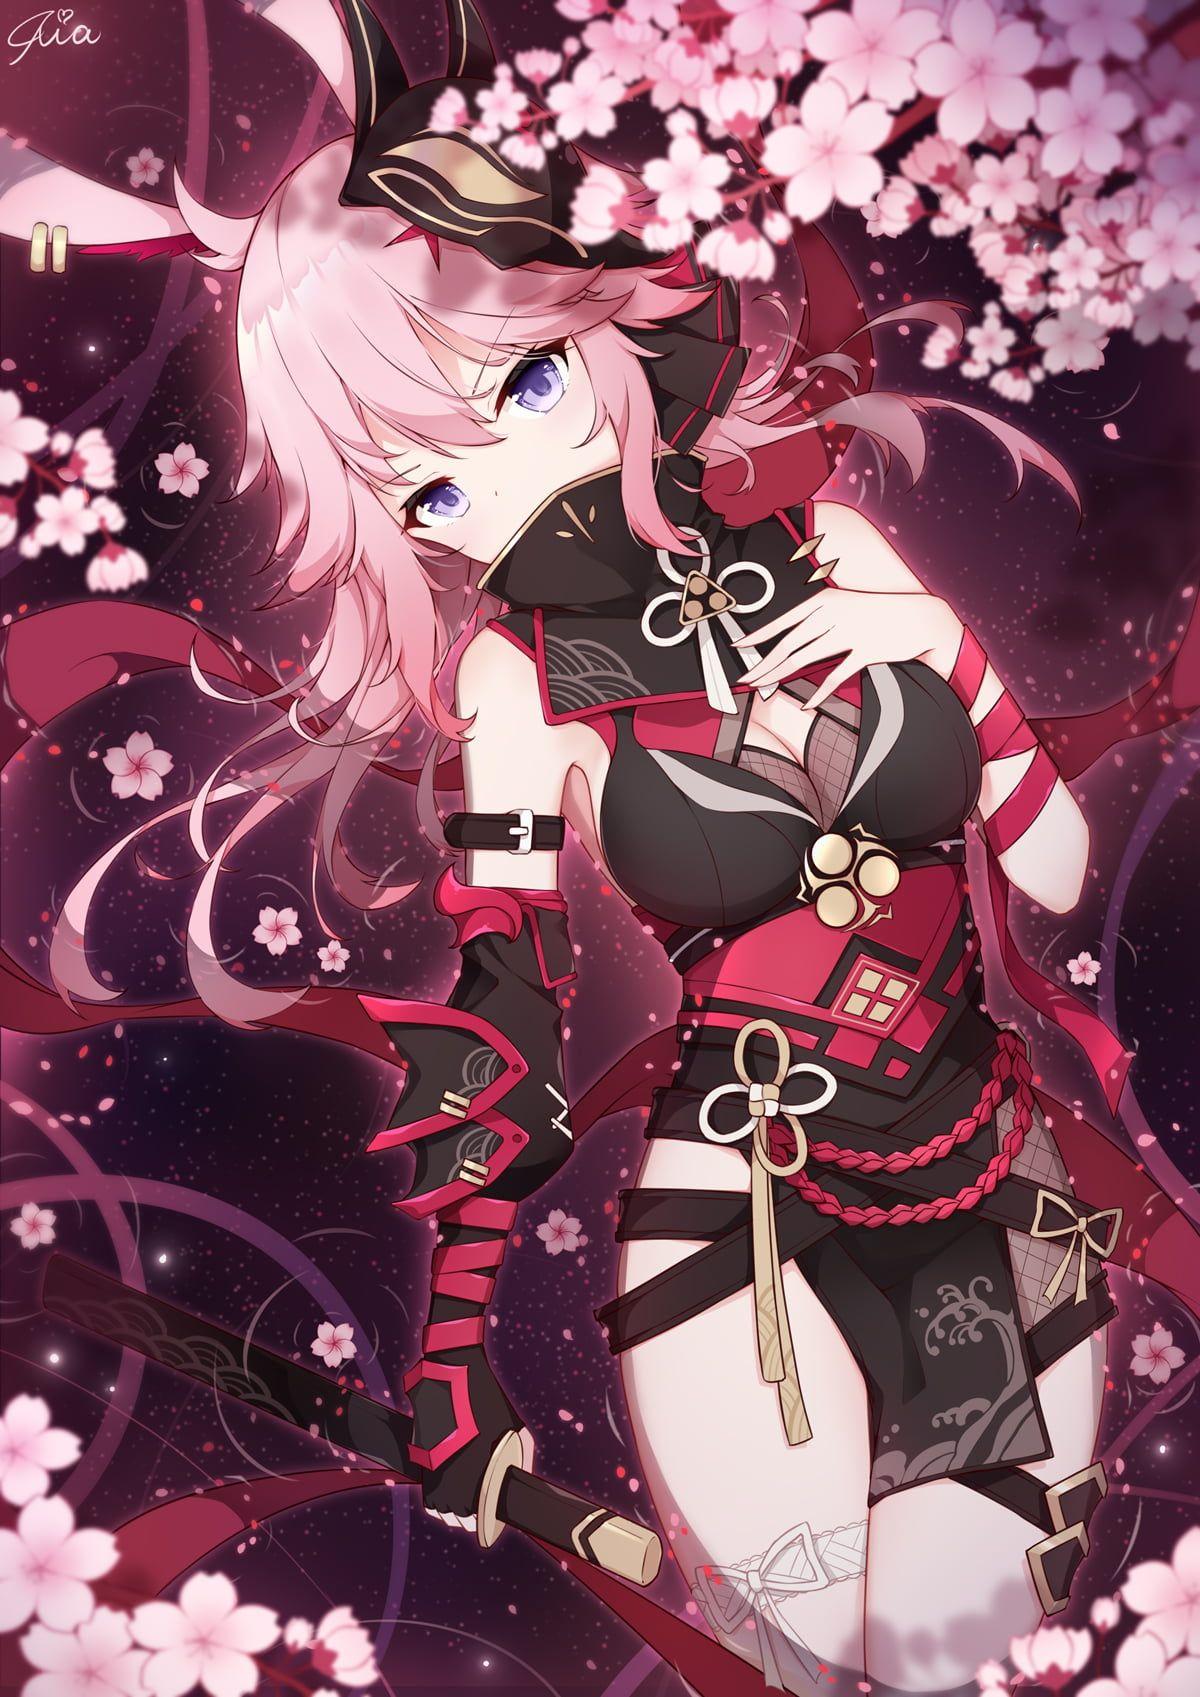 HD wallpaper: anime, anime girls, digital art, artwork, 2D, portrait display